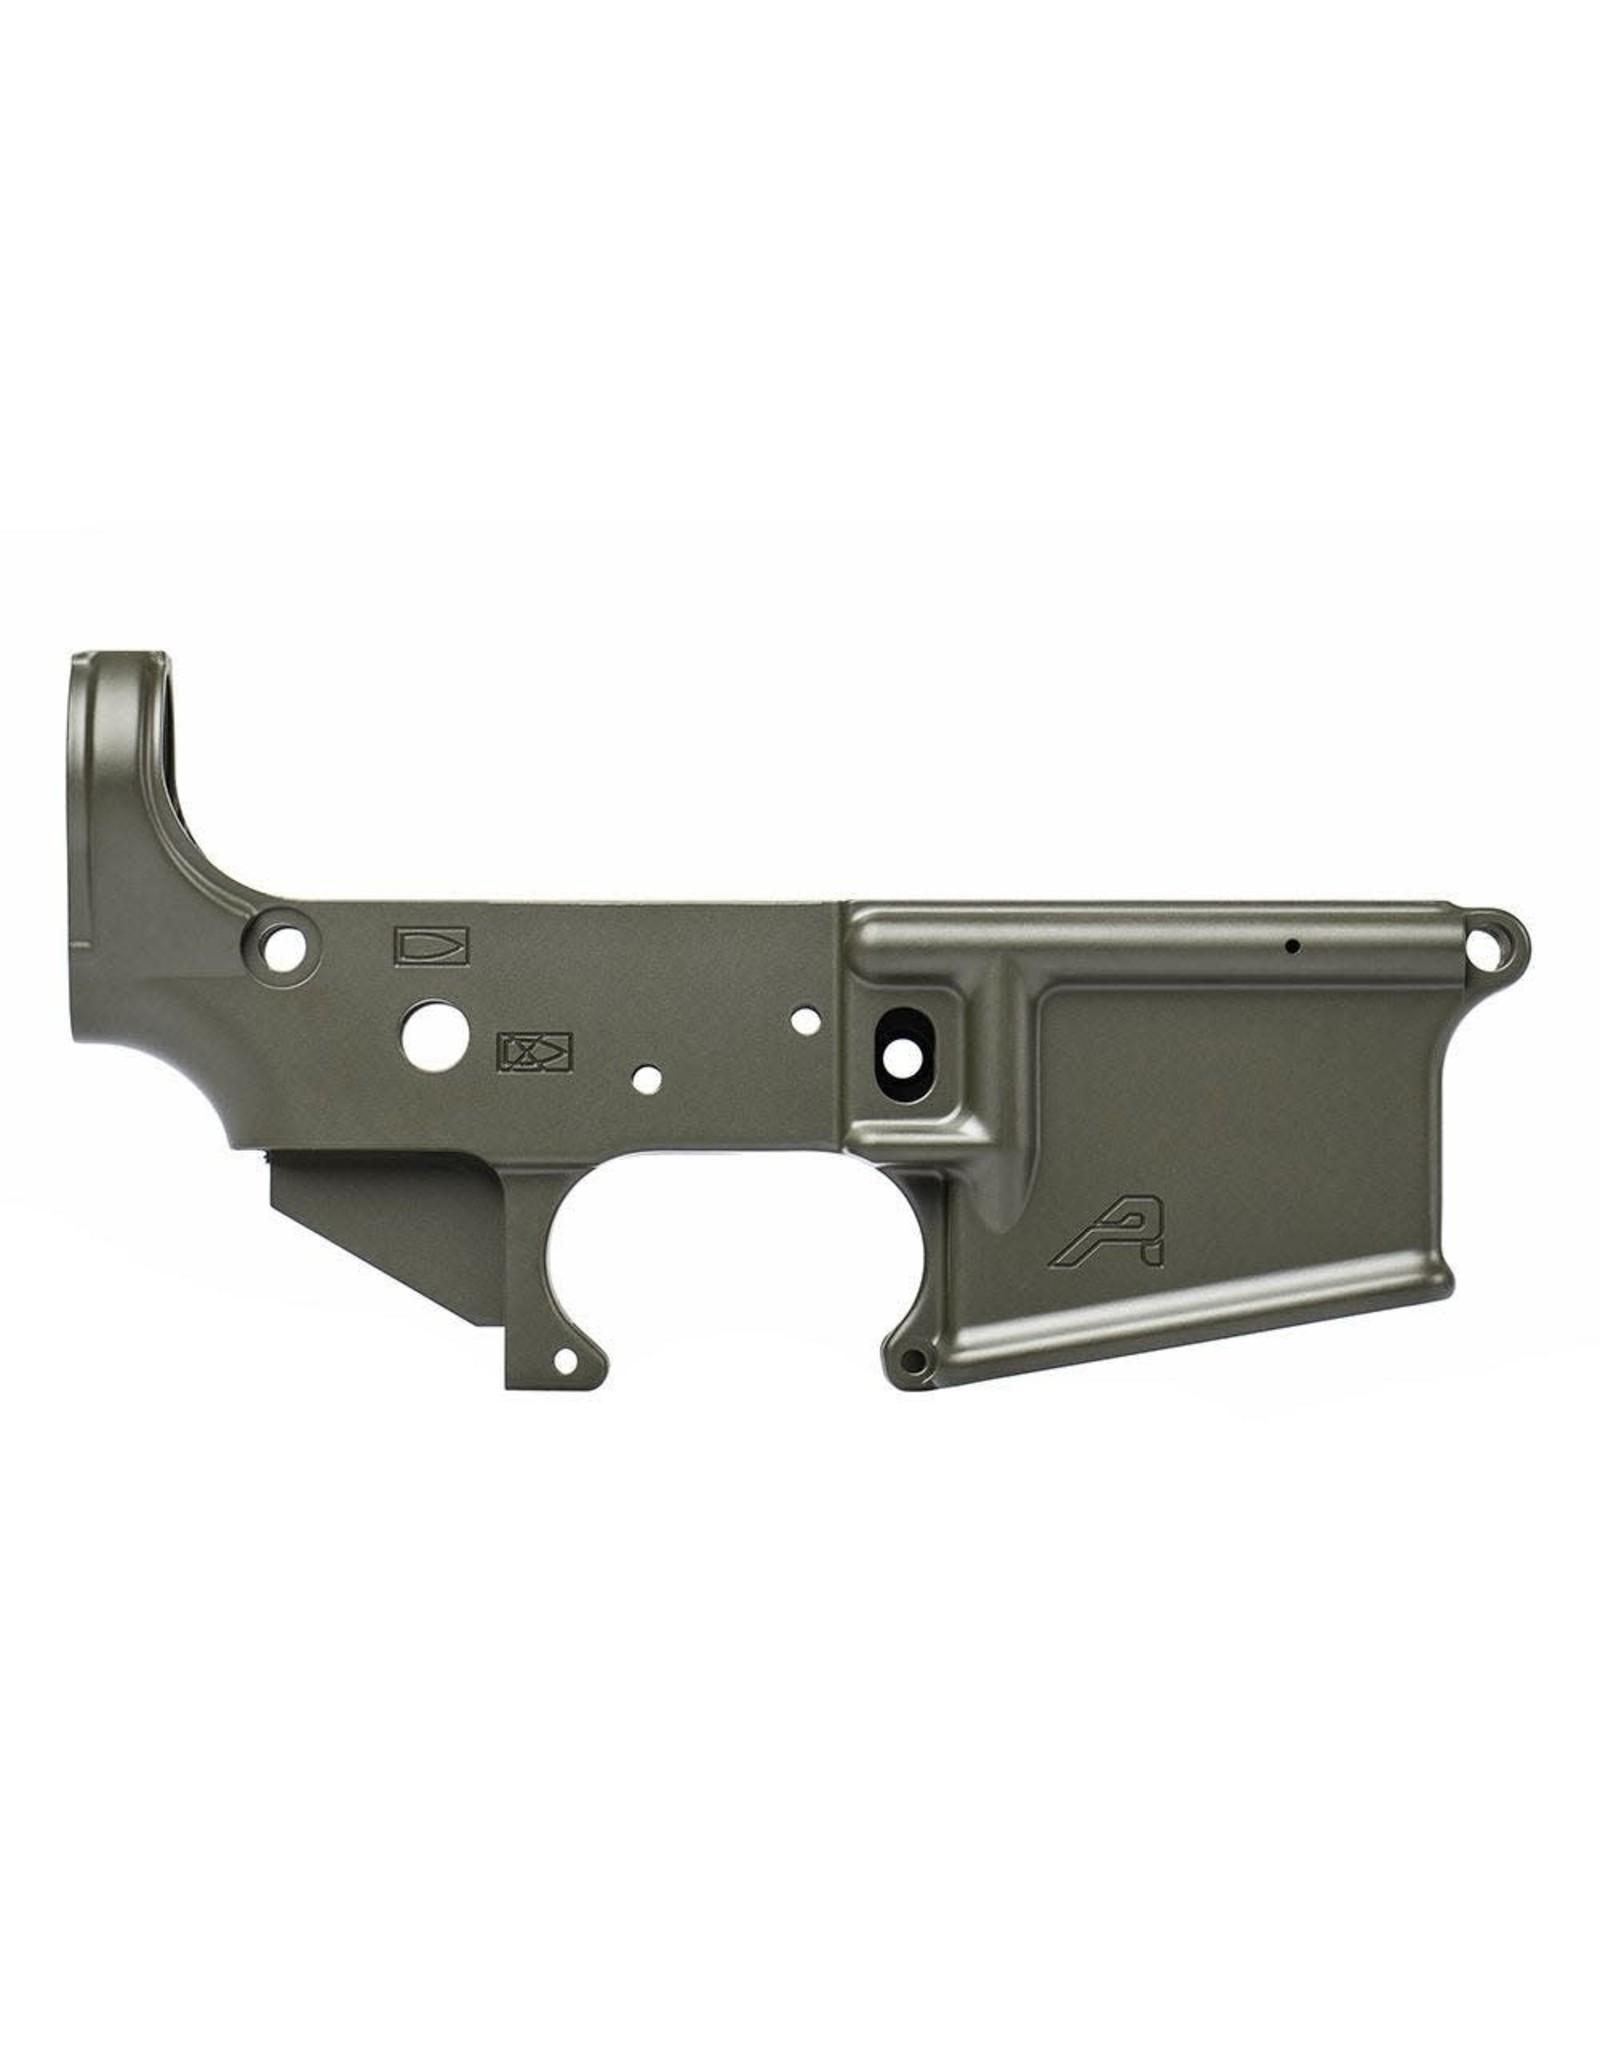 Aero Precision Aero Precision AR15 Stripped Lower Receiver - OD Green Cerakote